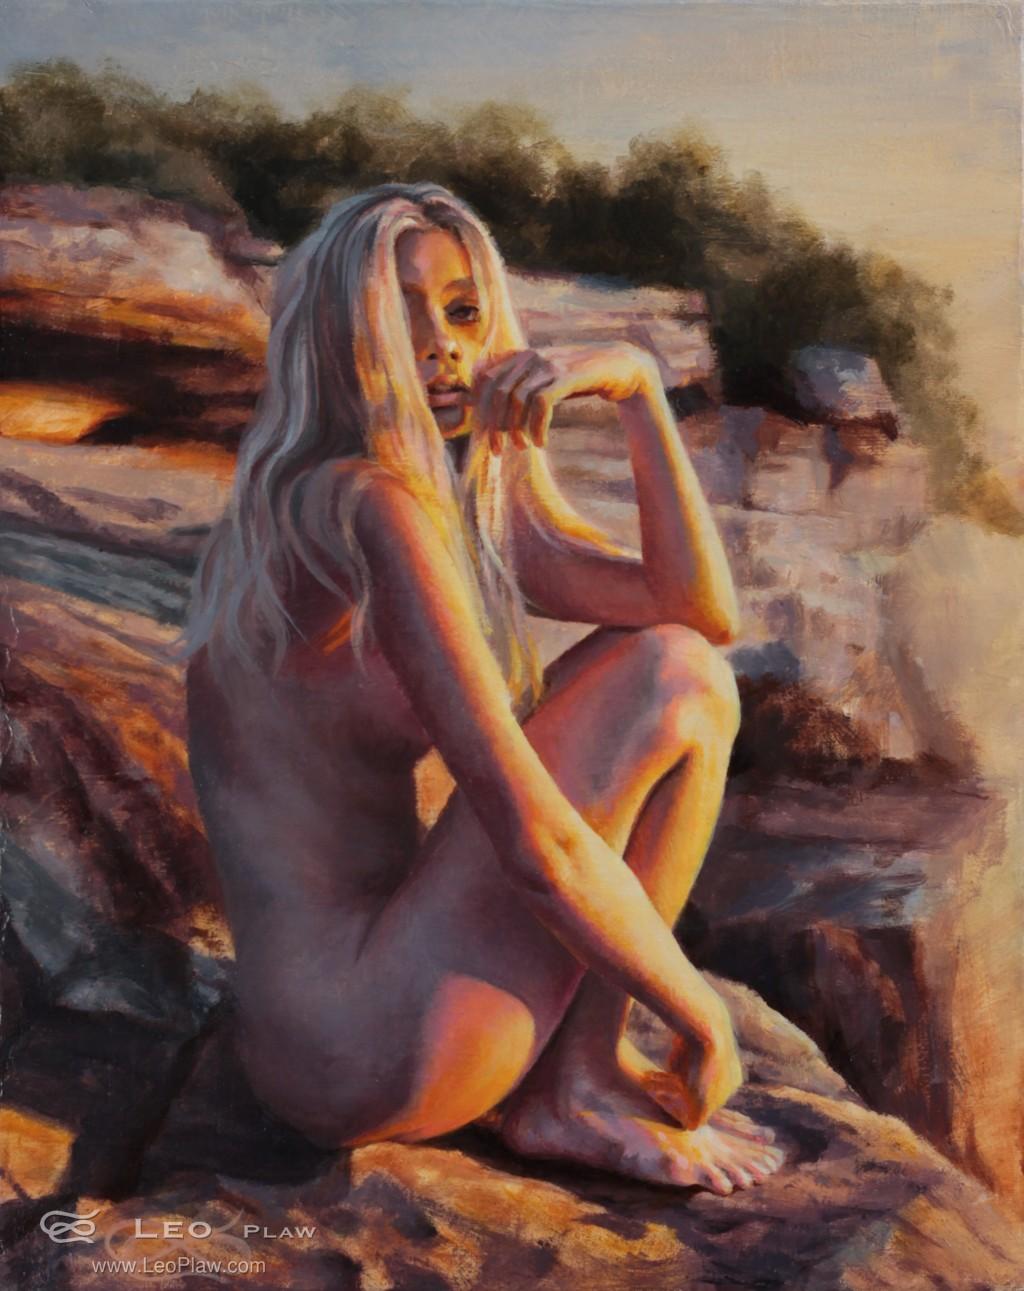 """Golden Light"", Leo Plaw, 24 x 30cm, oil on canvas"